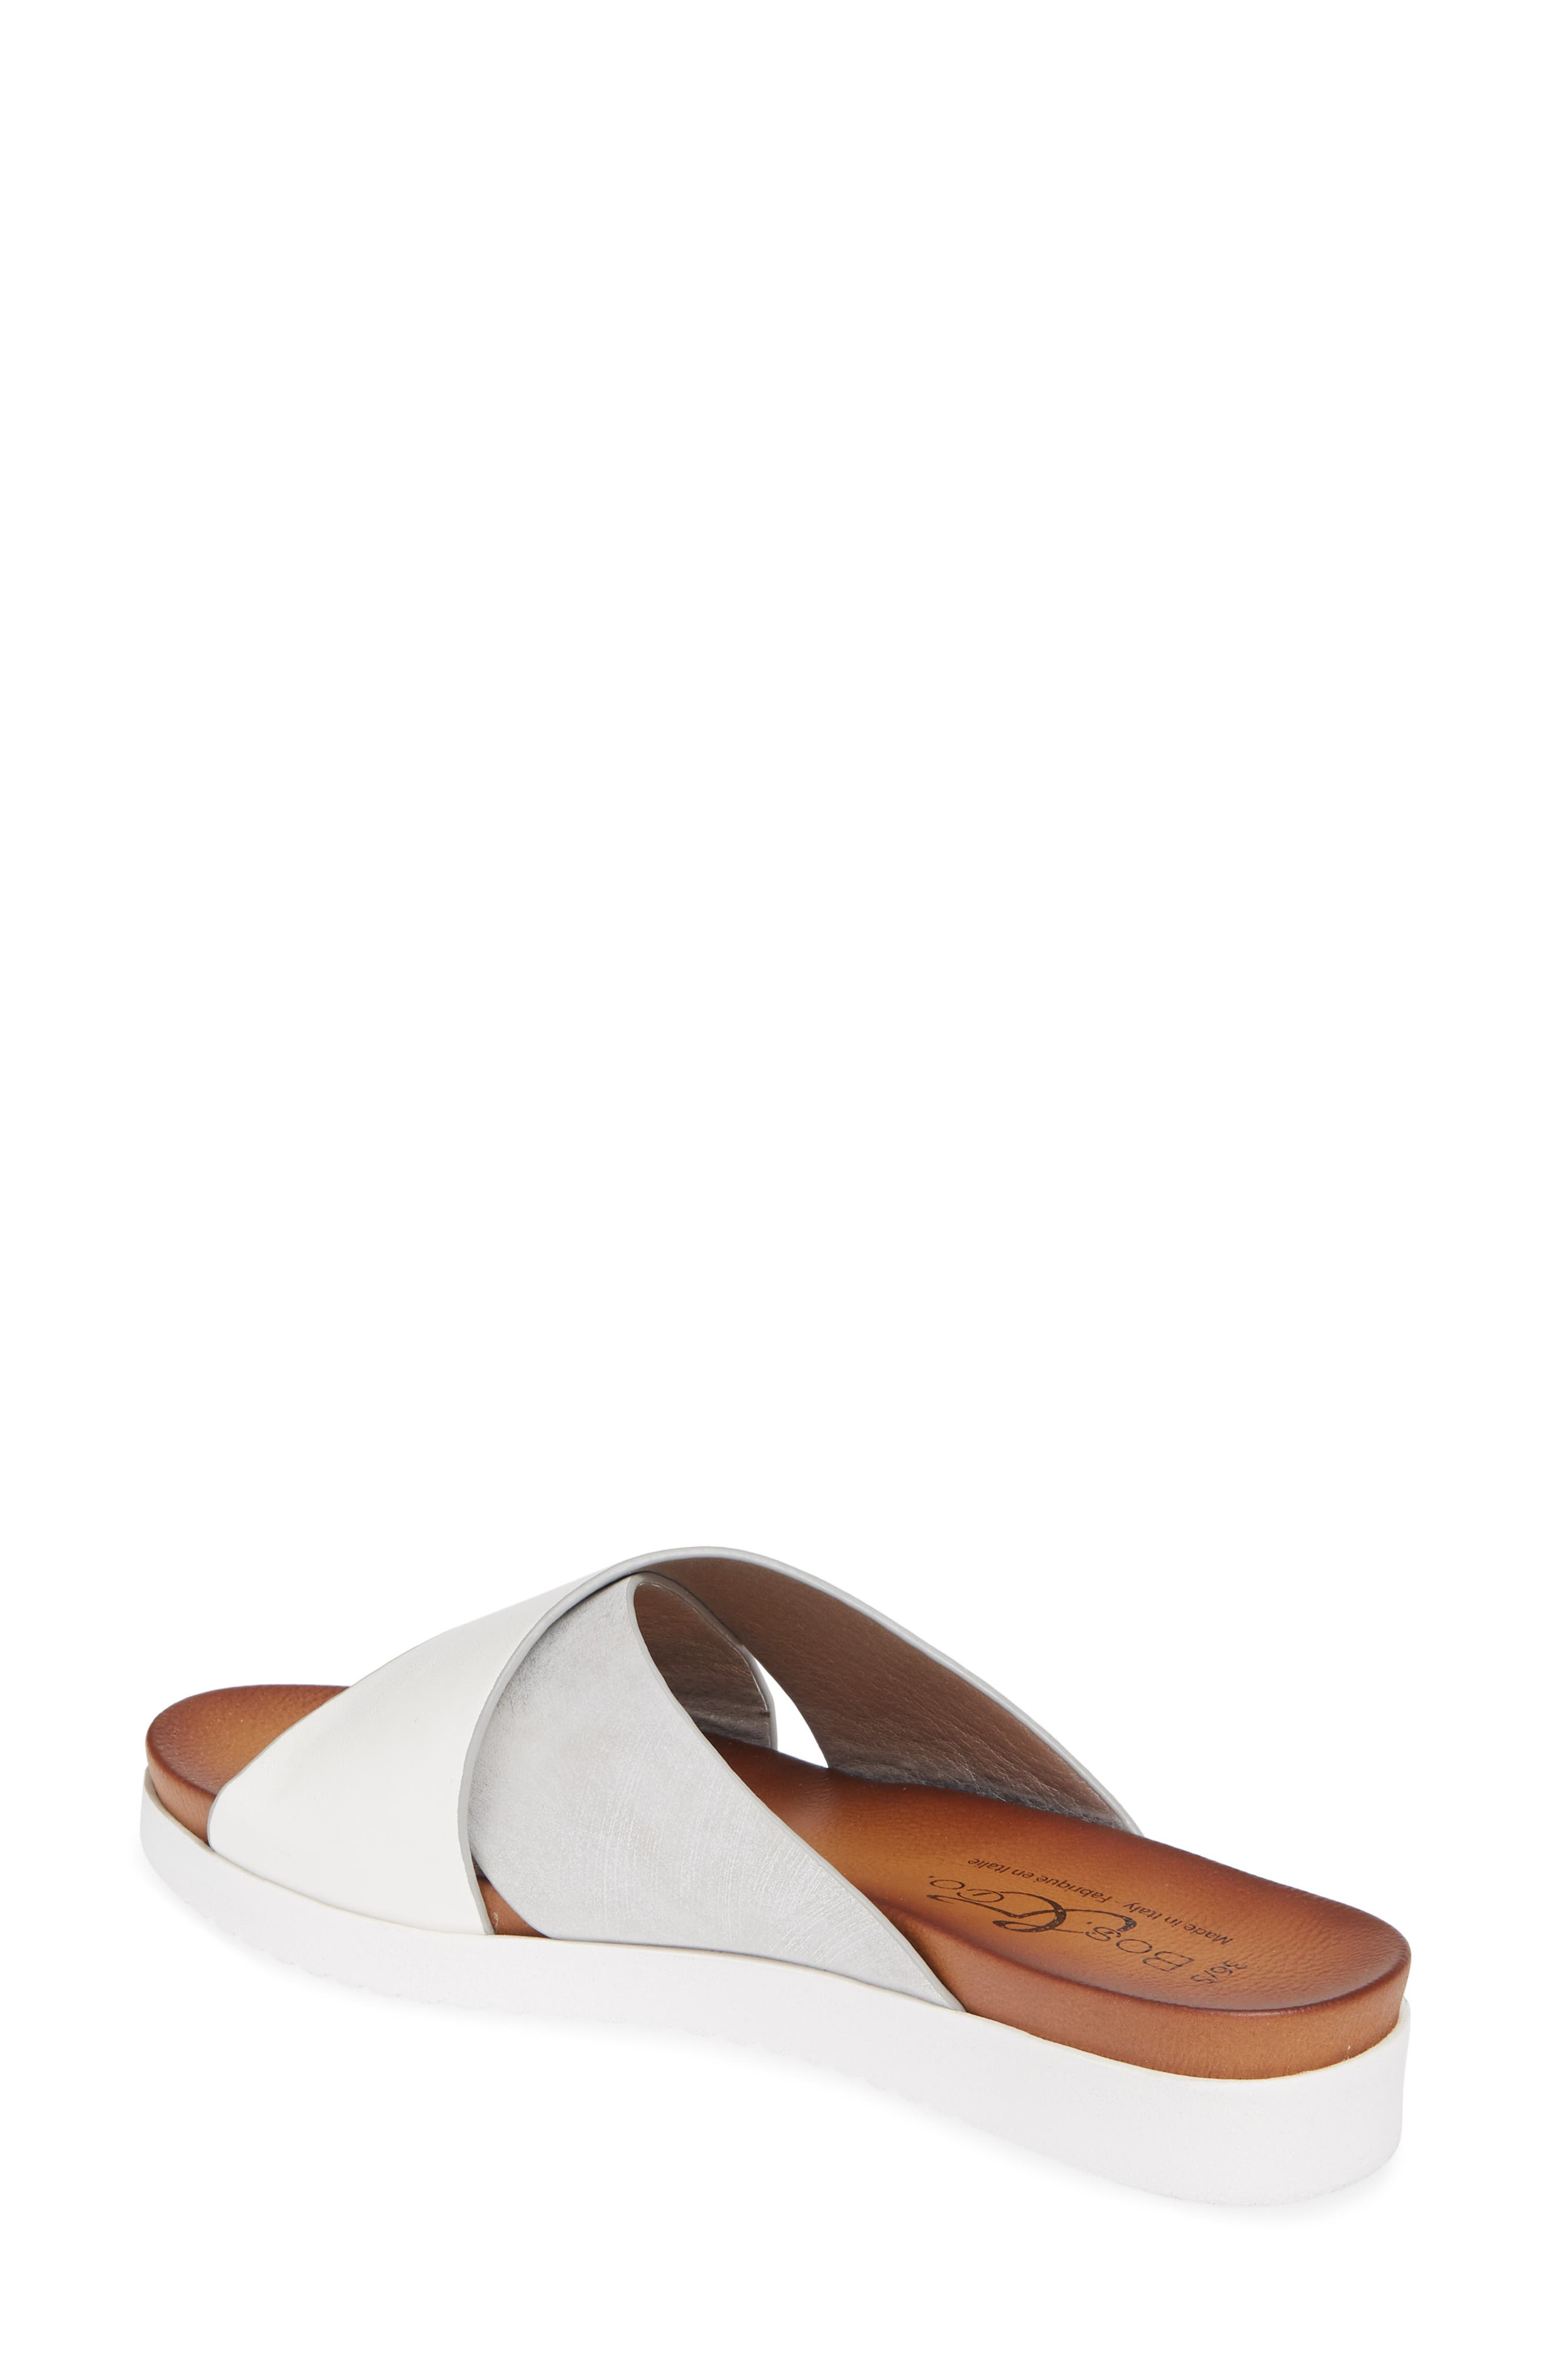 Rwon Slide Sandal,                             Alternate thumbnail 2, color,                             WHITE/ SILVER LEATHER